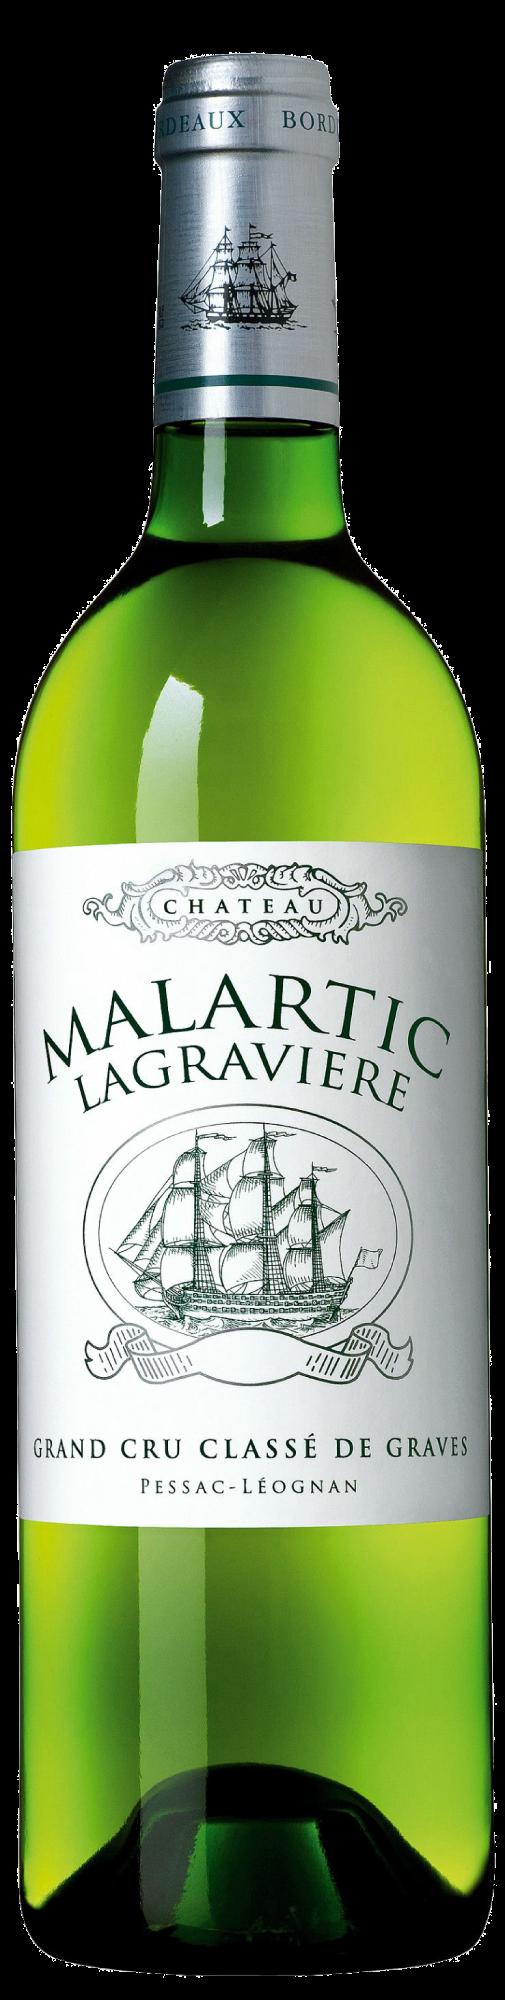 Chateau Malartic Lagraviere Blanc Pessac Leognan 2008 - магазин склад winewine